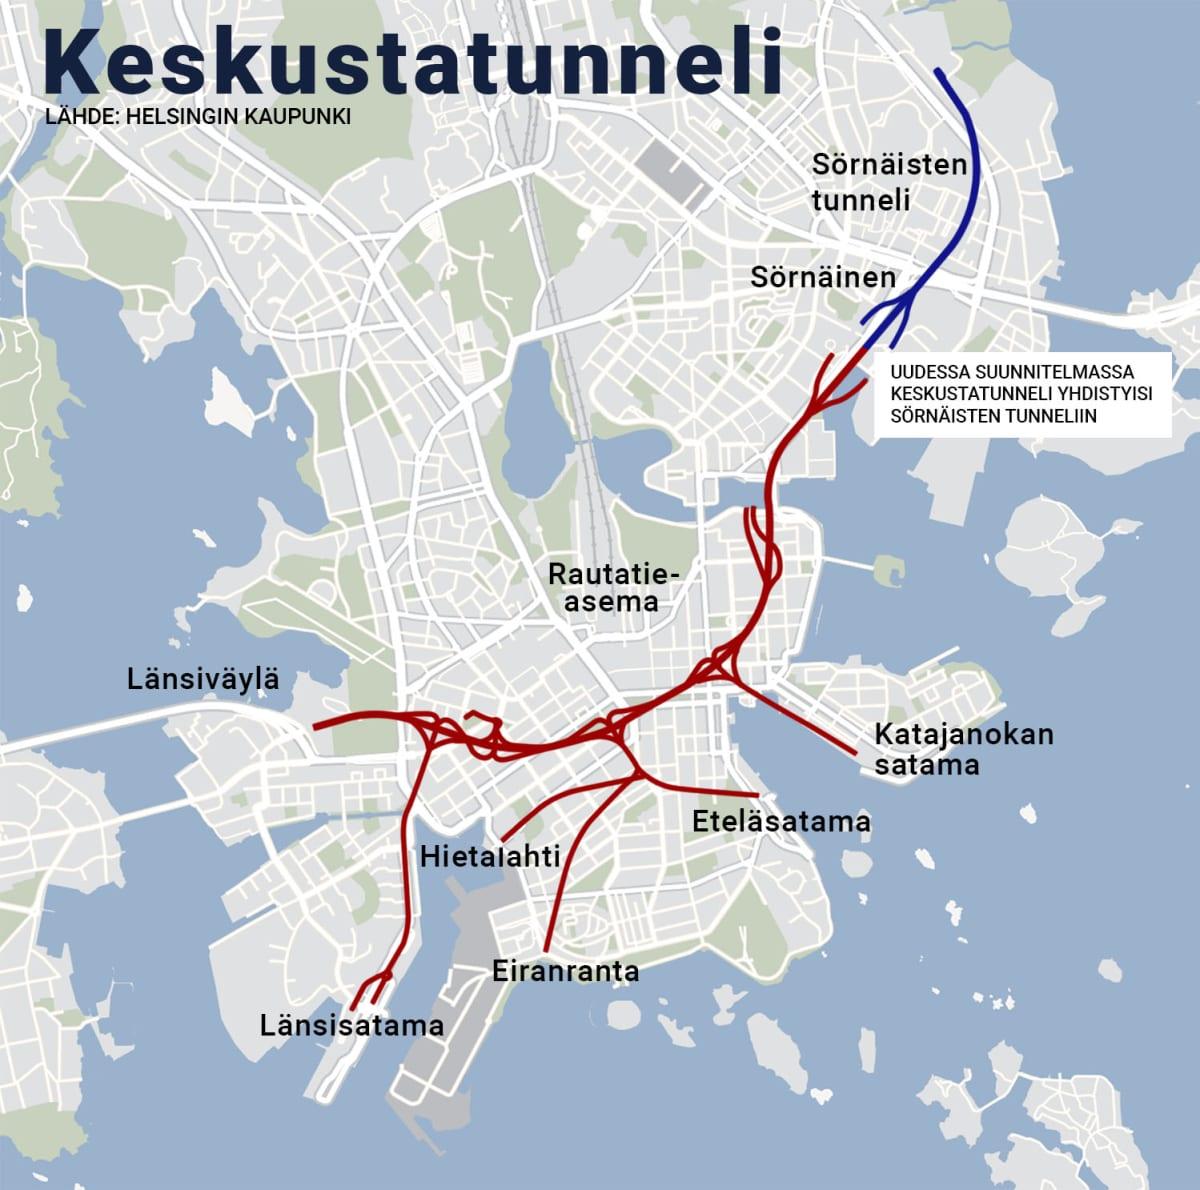 Helsingin keskustatunnelisuunnitelma